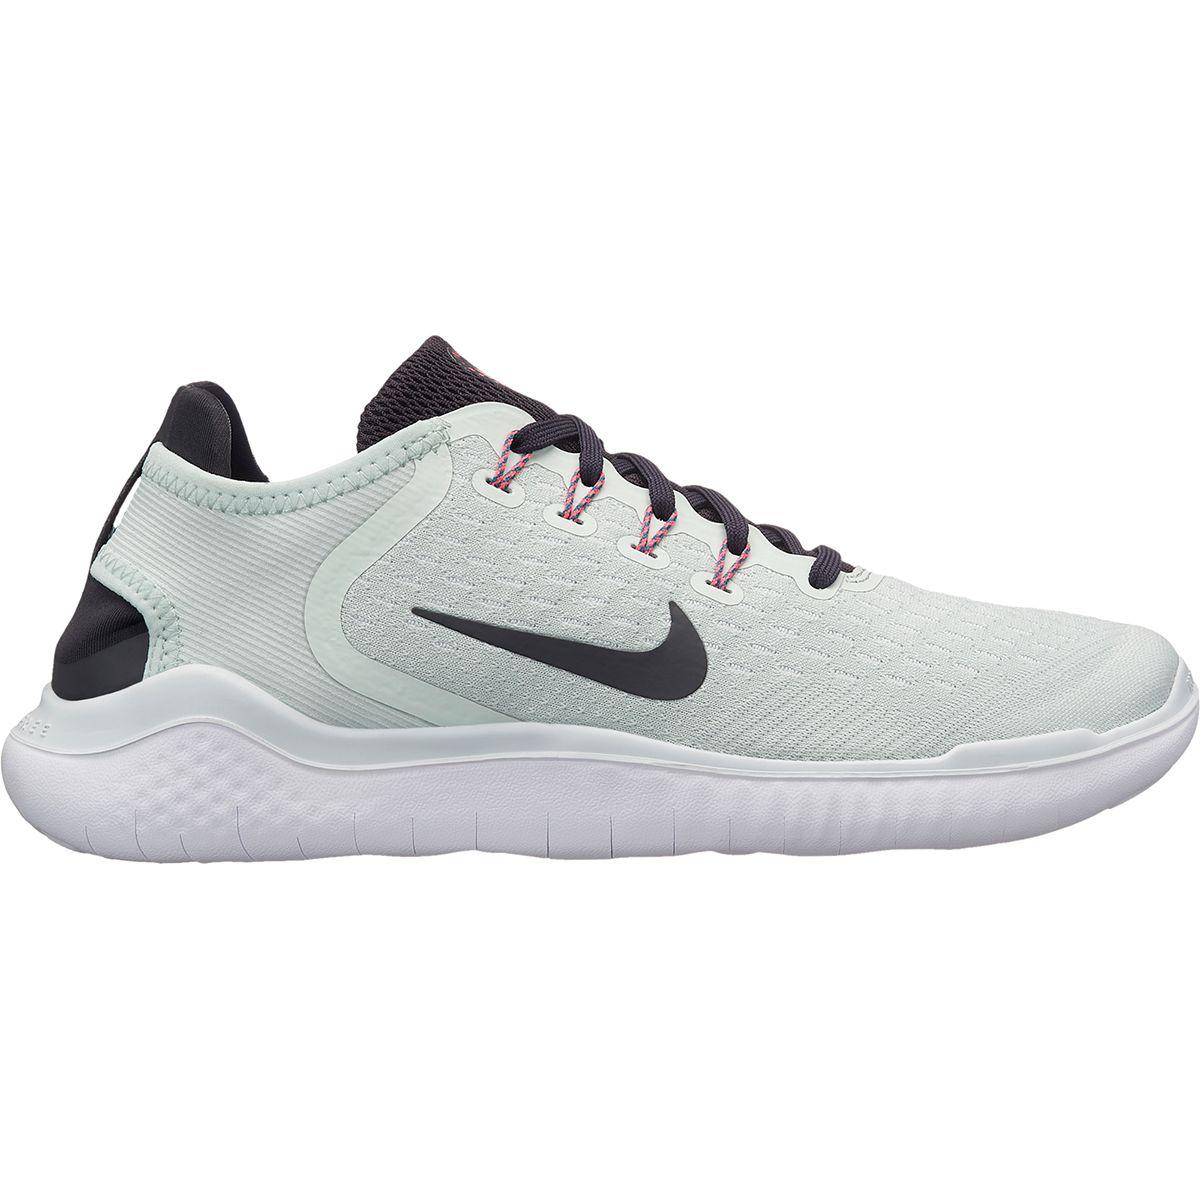 Nike Free RN Running Shoe - Women's Barely Grey/Oil Grey-White-Geode Teal, 6.5